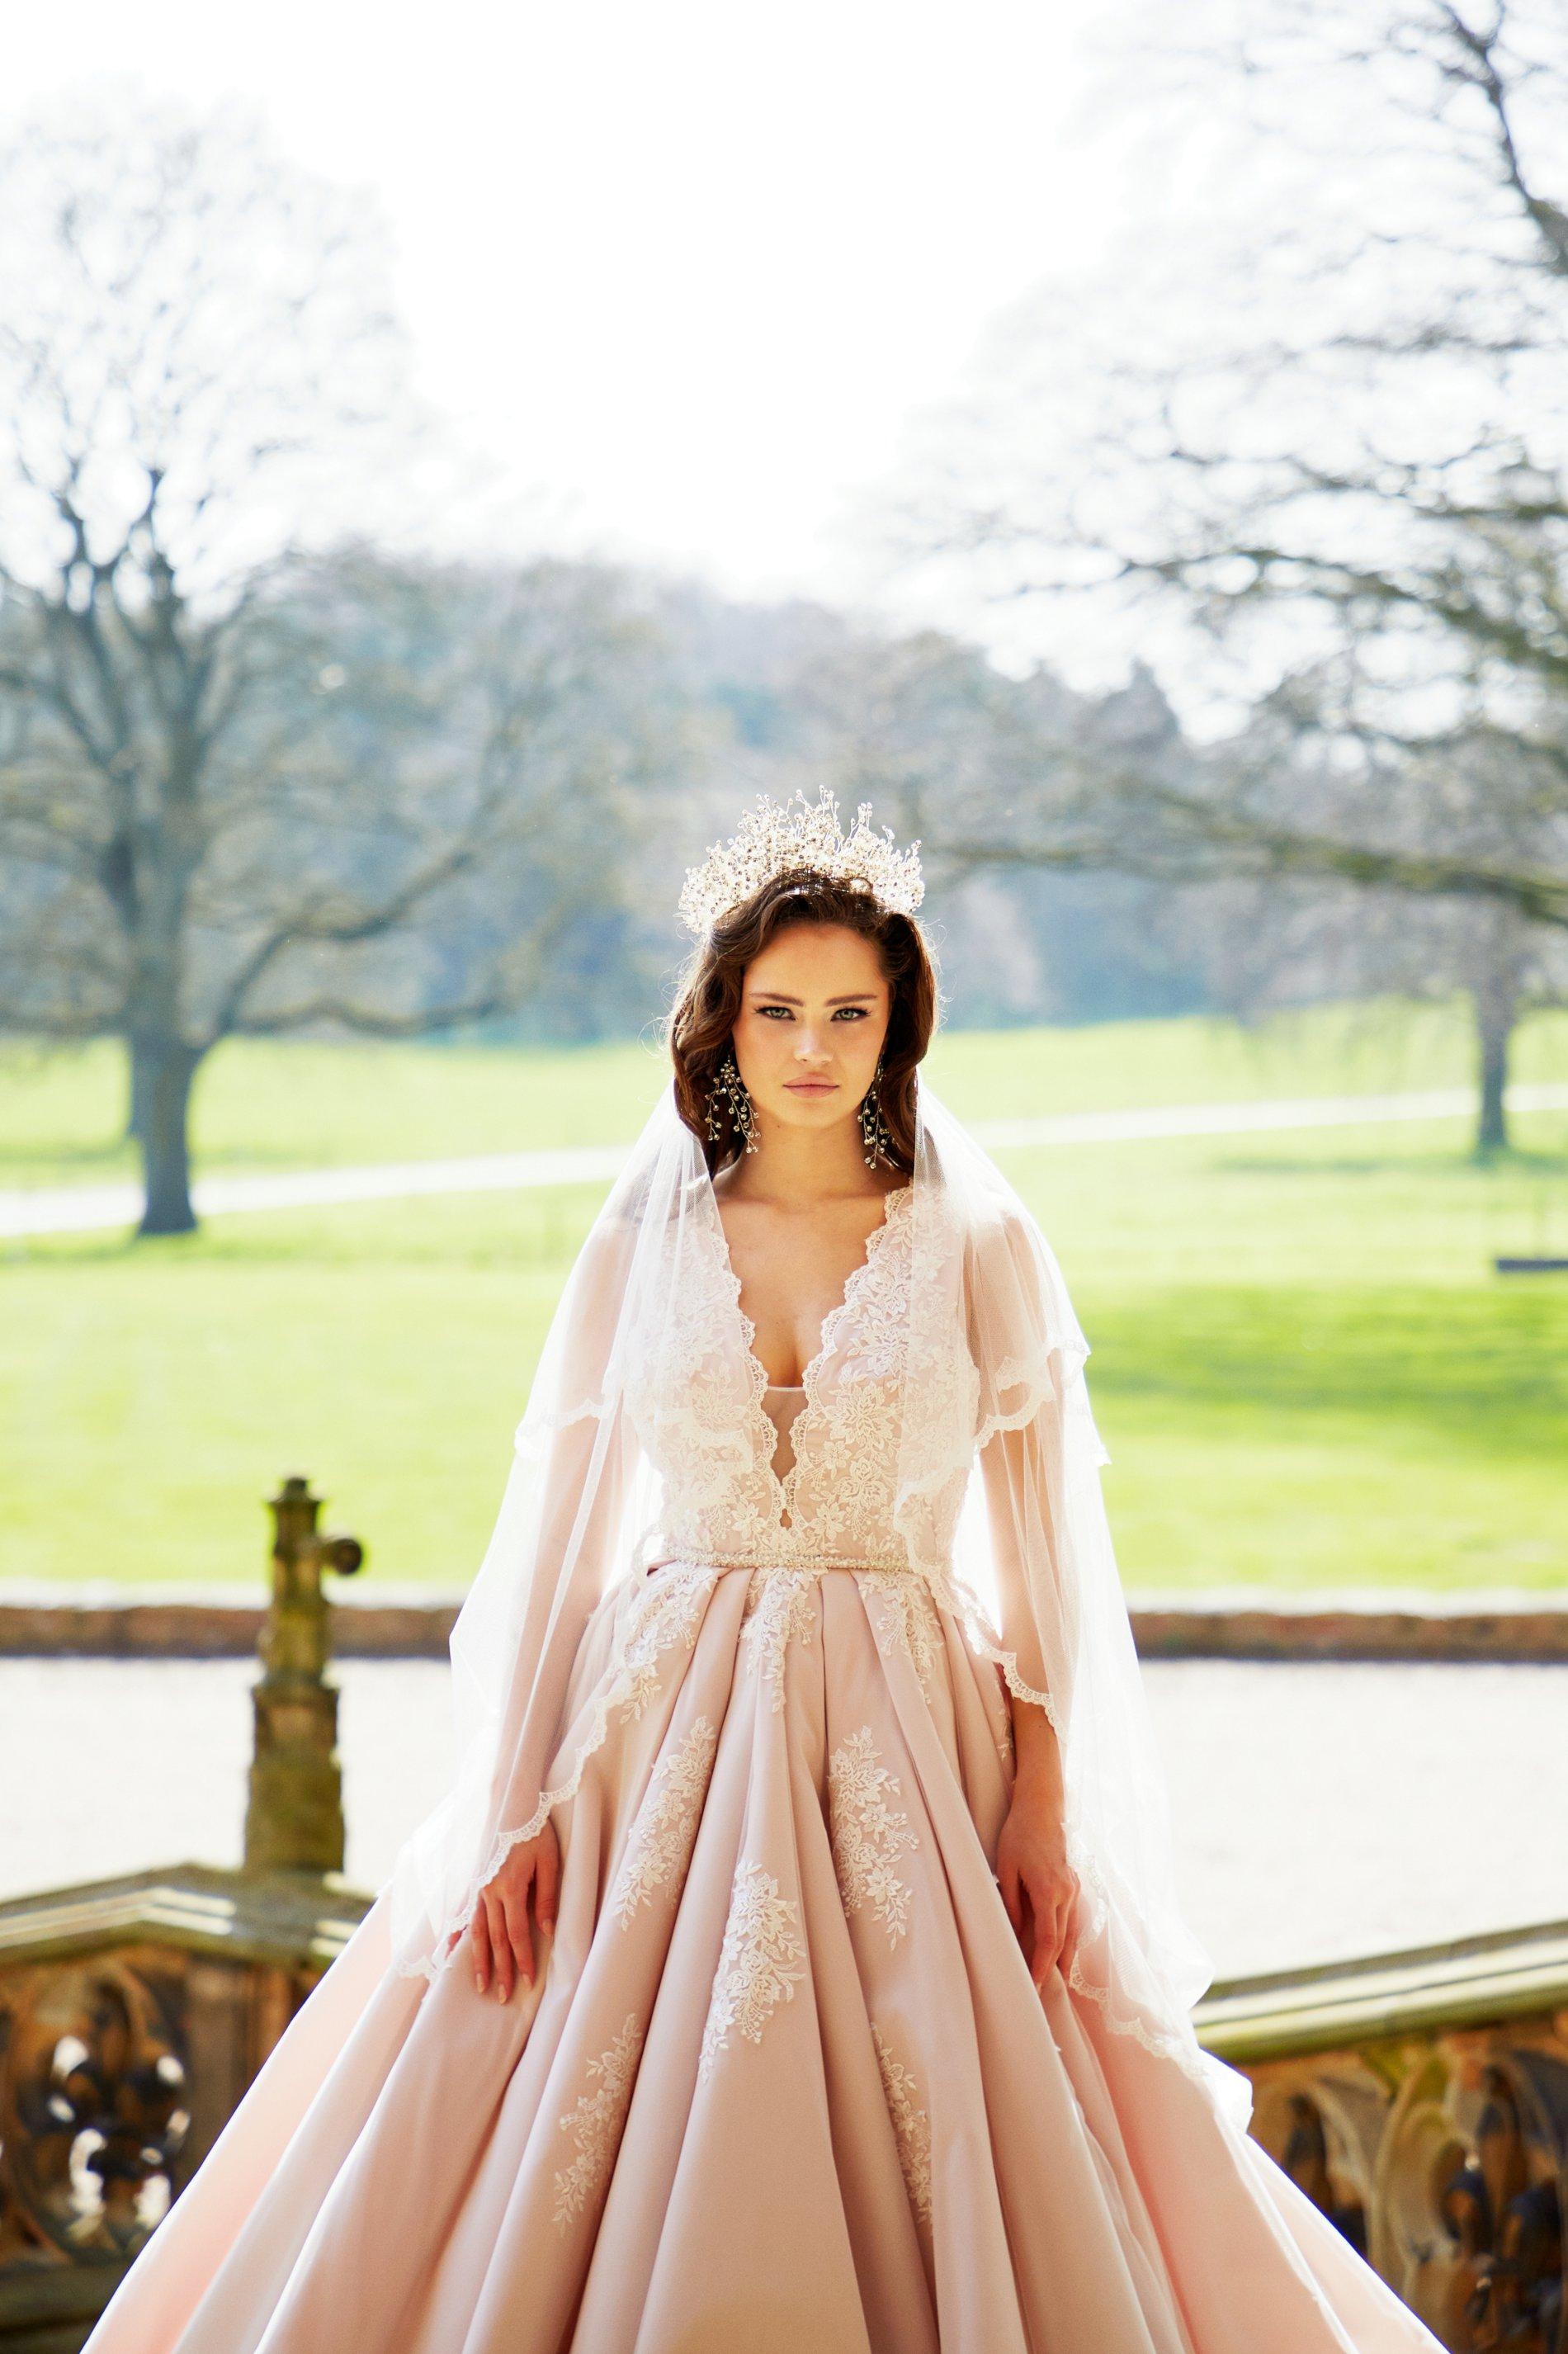 Danielle Sykes Bridal Designs (28)